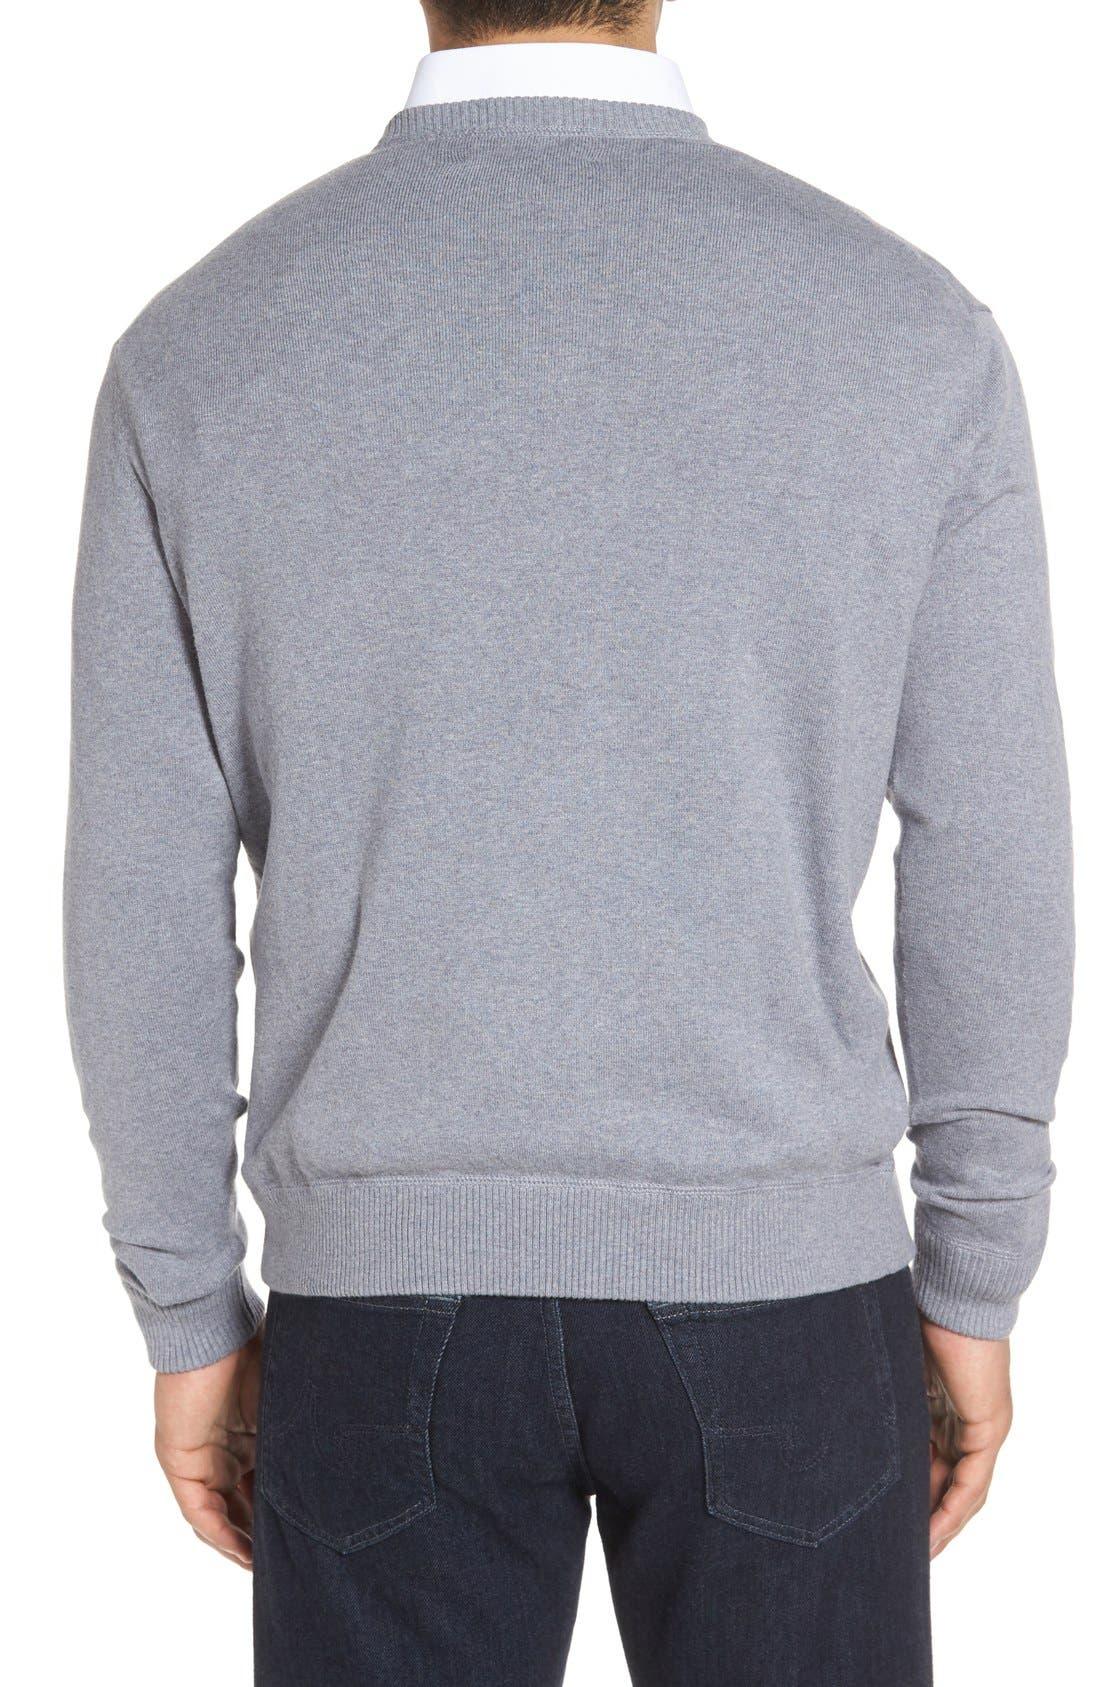 'Jersey Sport' Cotton Blend Crewneck Sweater,                             Alternate thumbnail 10, color,